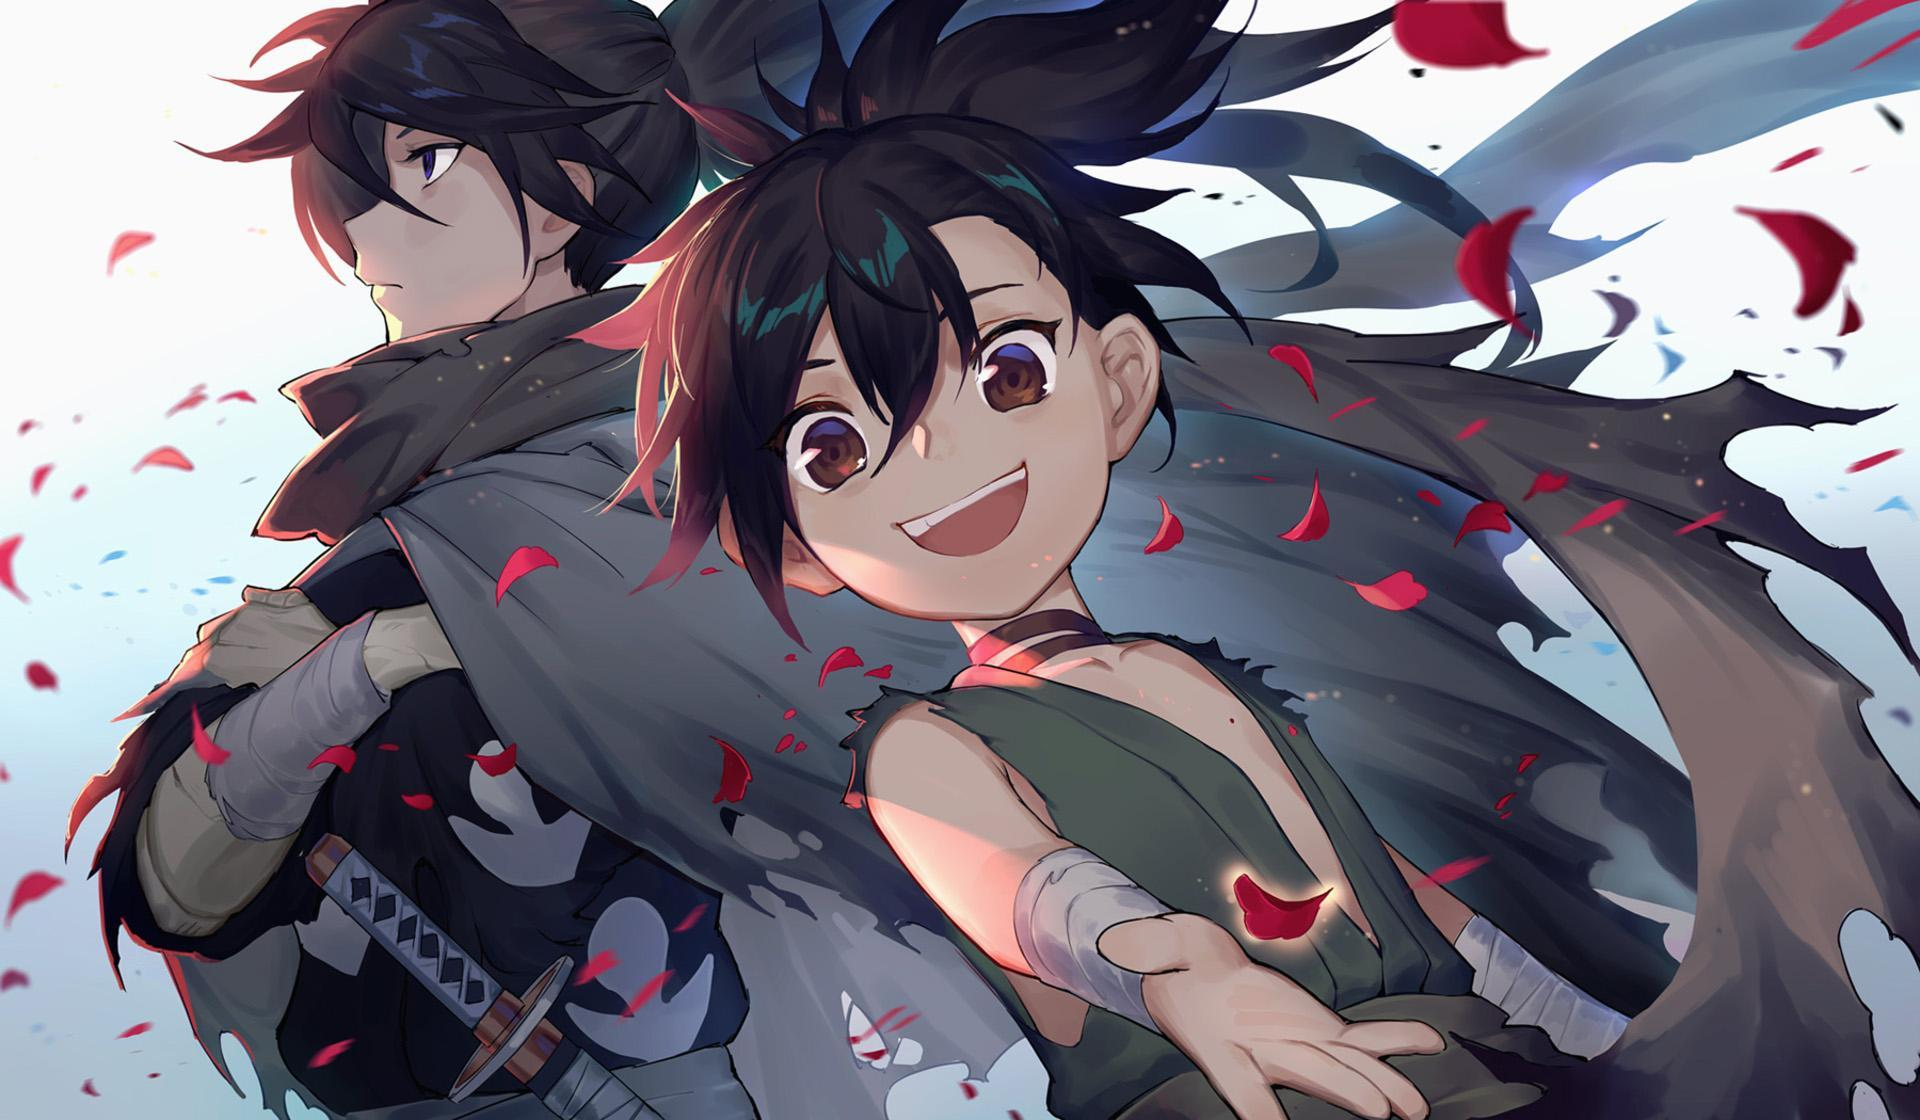 dark adventure anime similat to Demon Slayer, Dororo